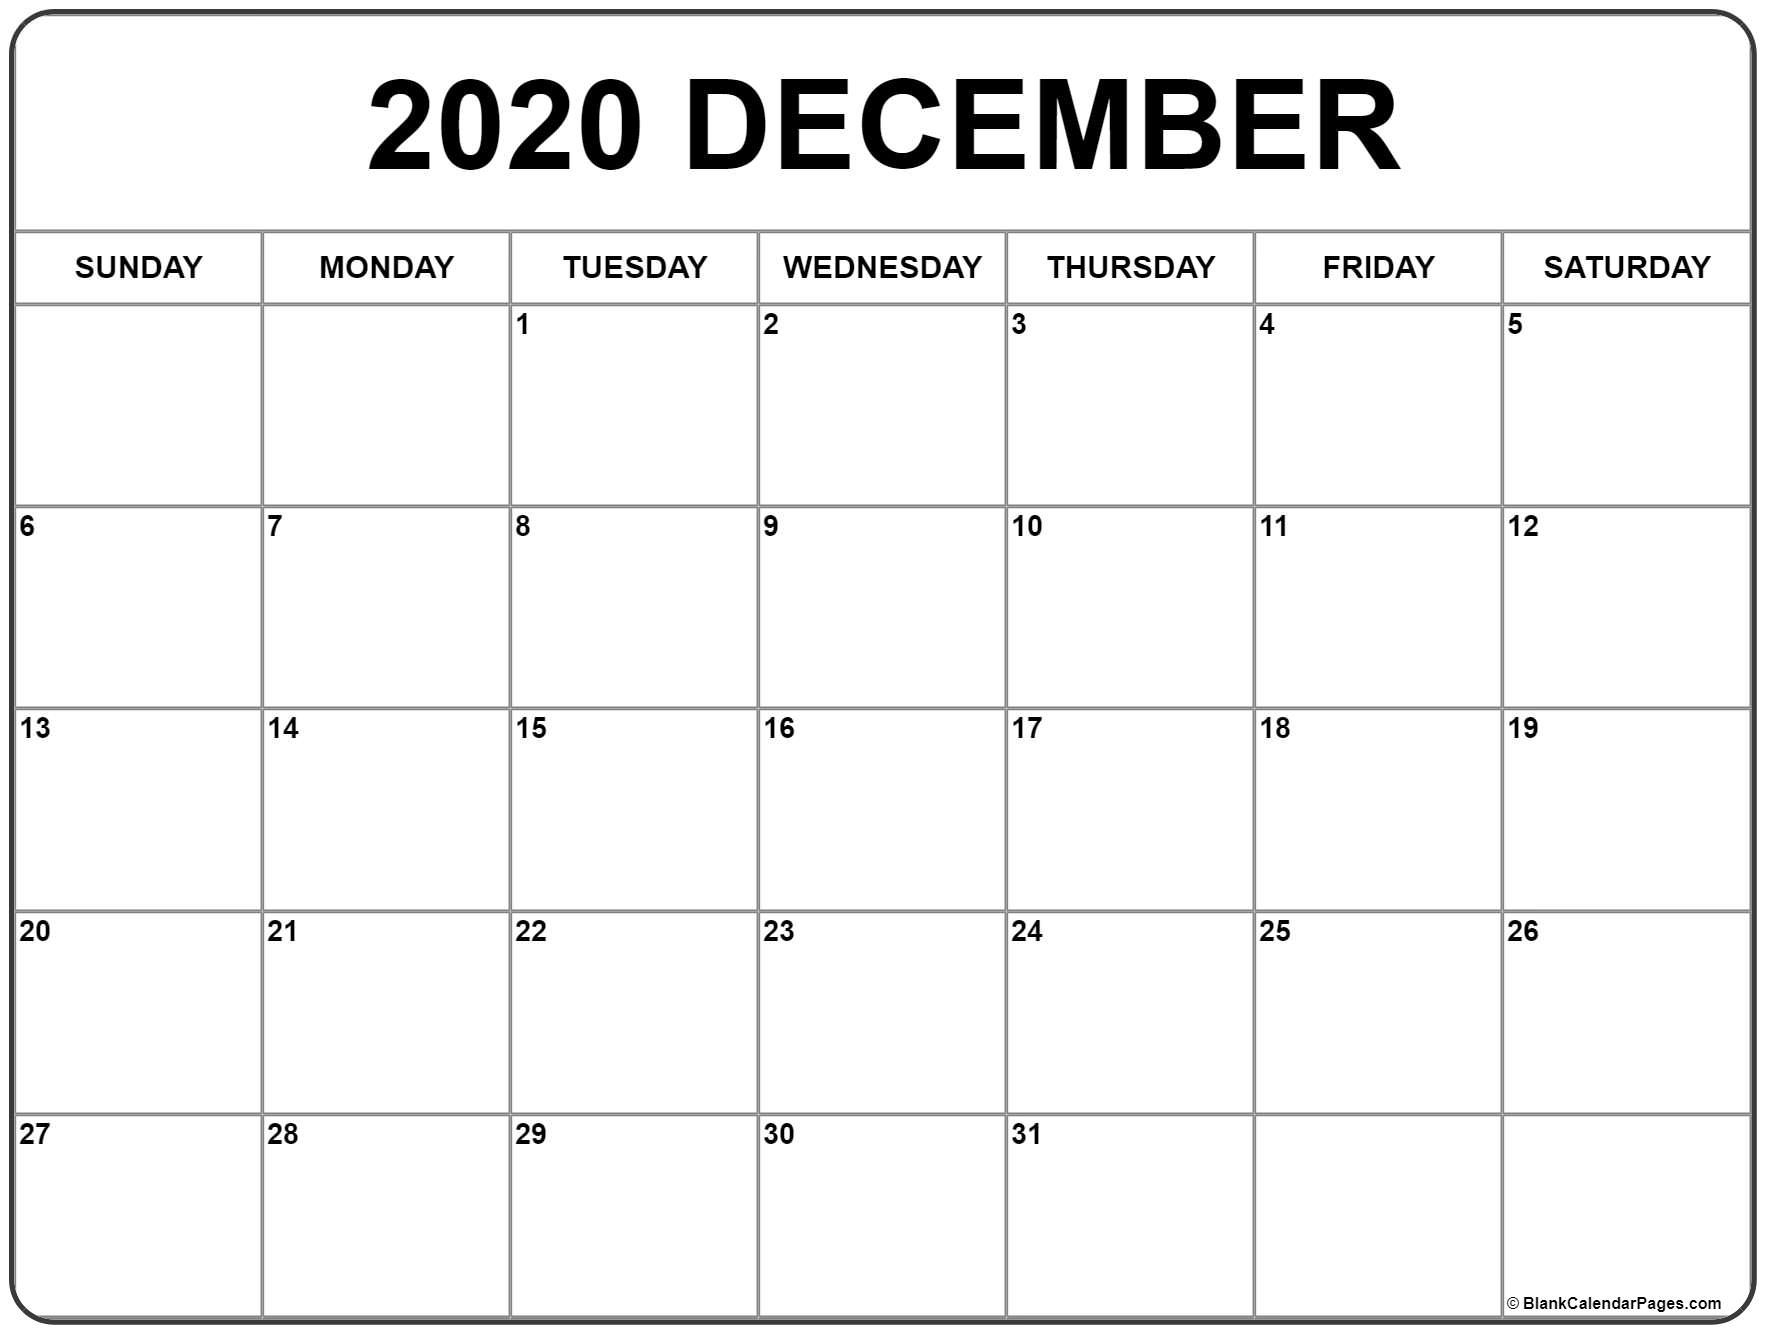 Blank Calendar December 2020  Bolan.horizonconsulting.co inside Michel Zbinden December 2020